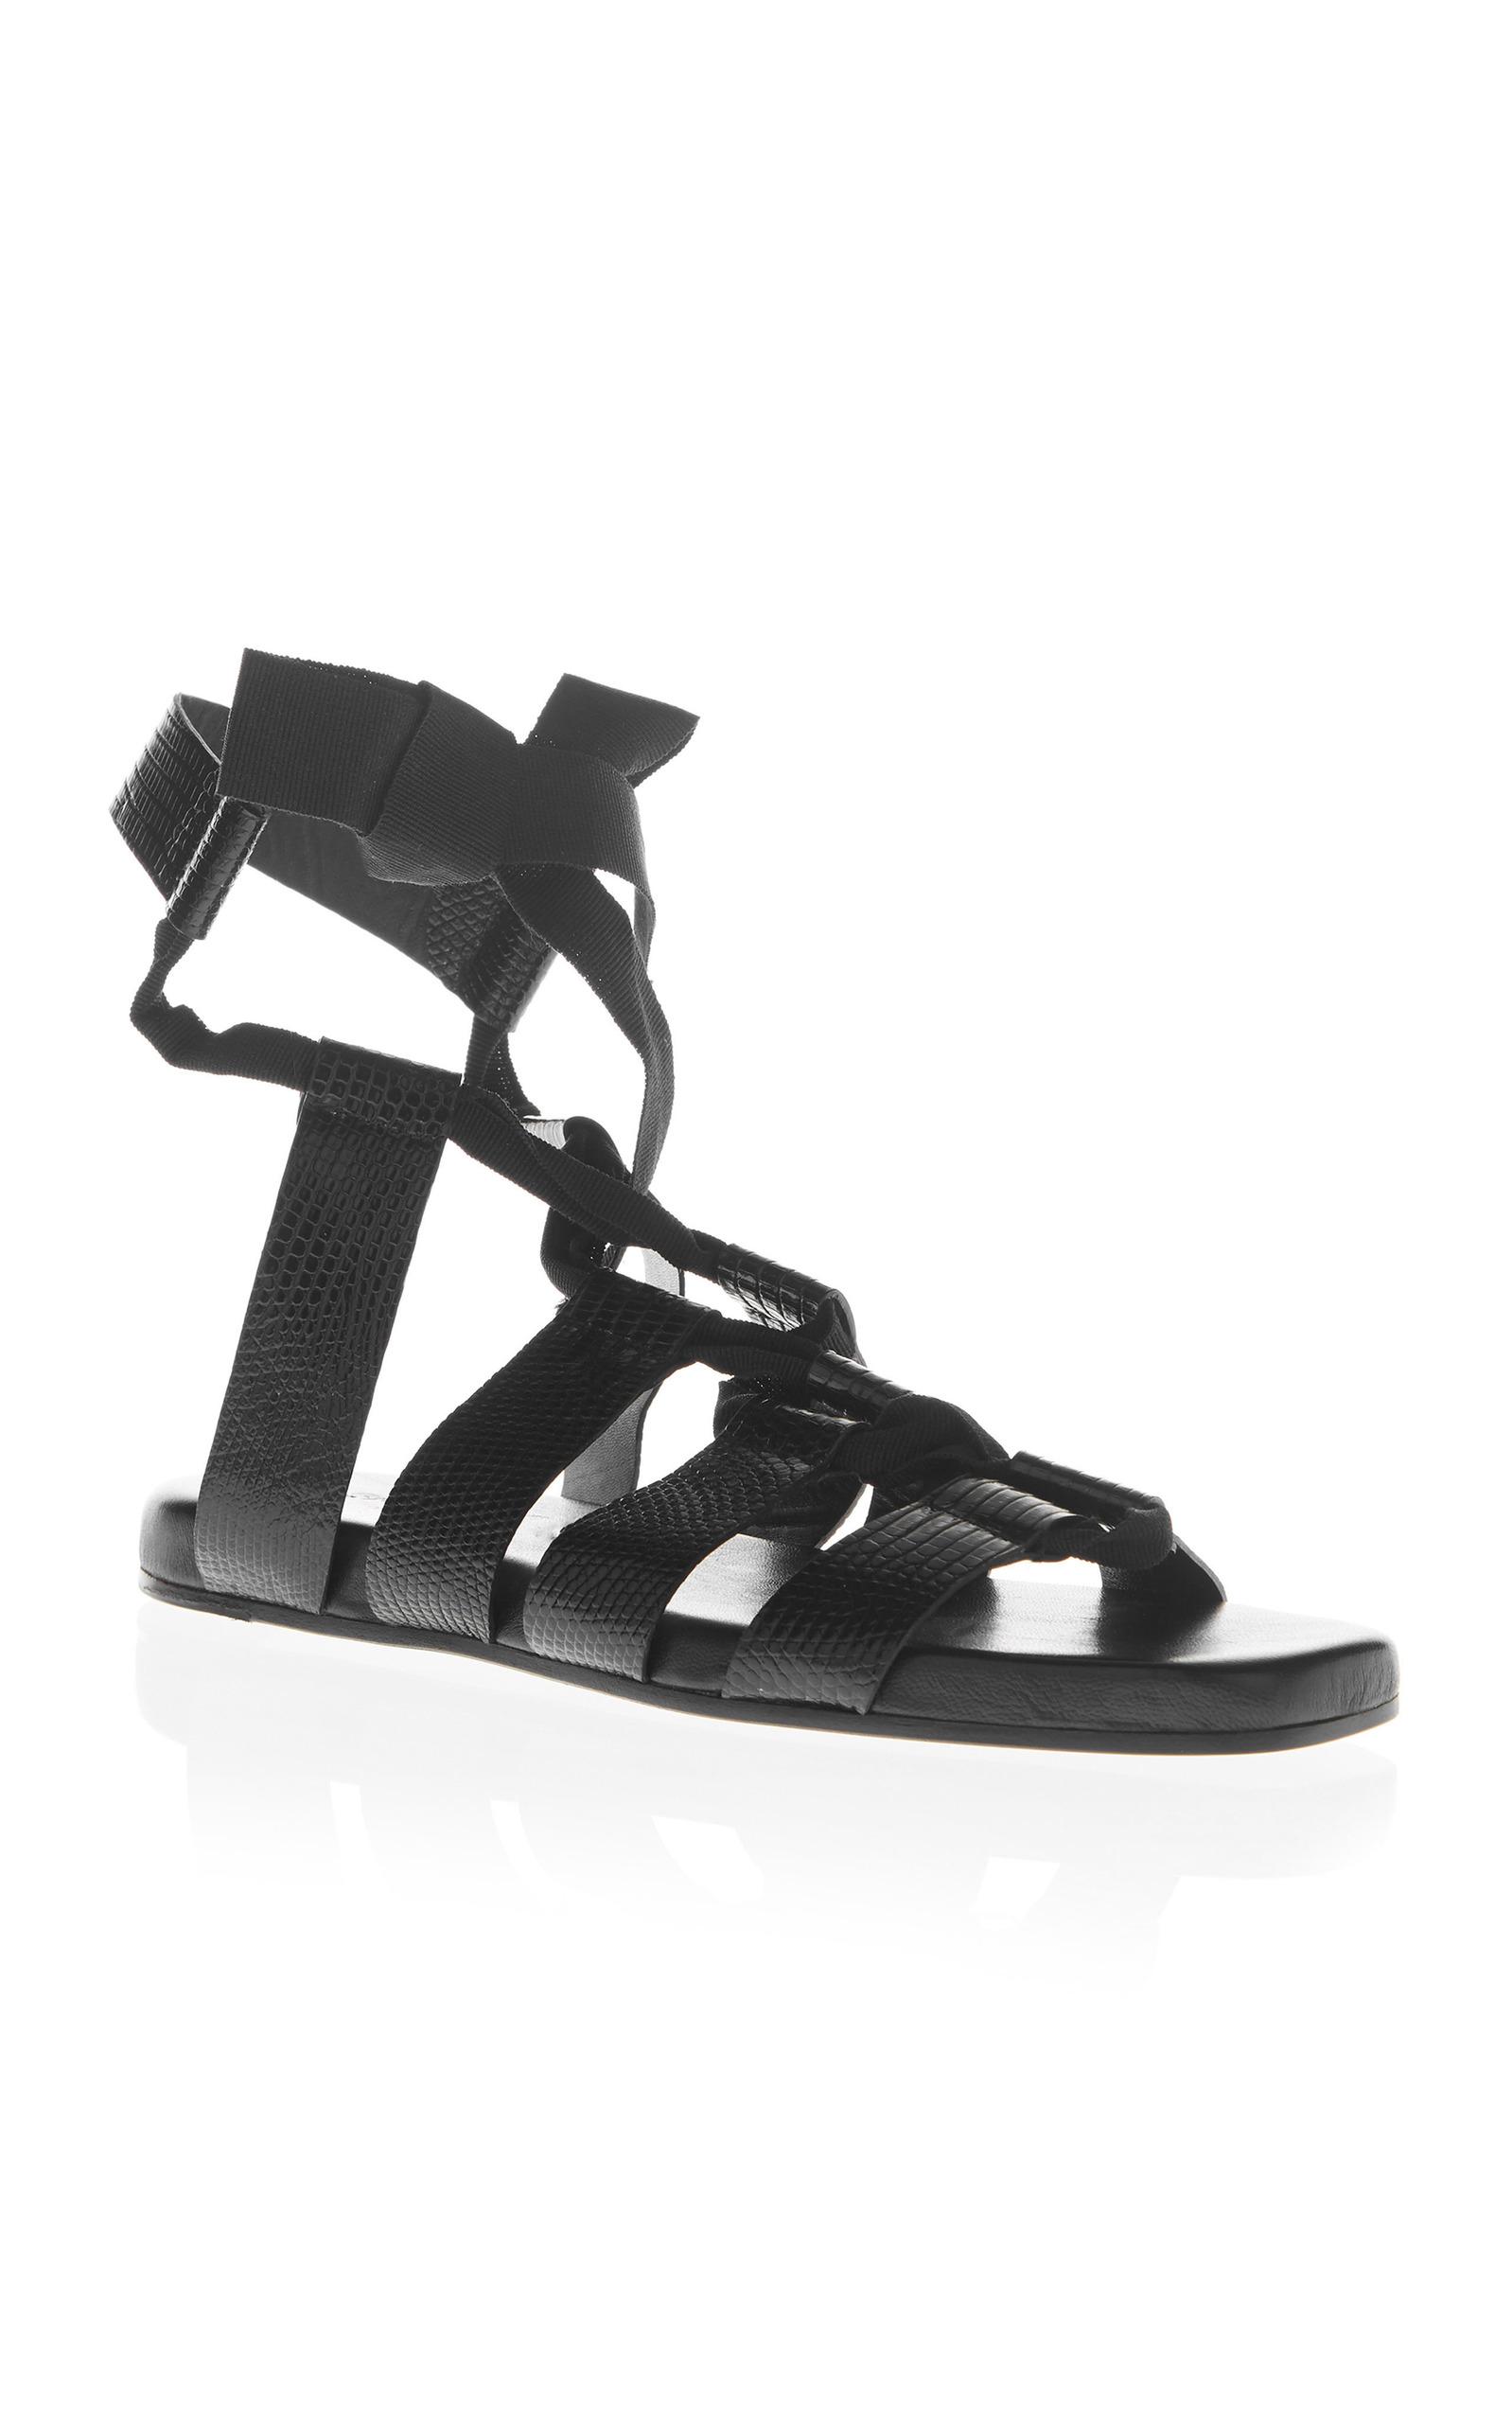 Jil Sander Lace up sandals Online Get New New Arrival Buy Cheap Discounts eKyuk0P3tW